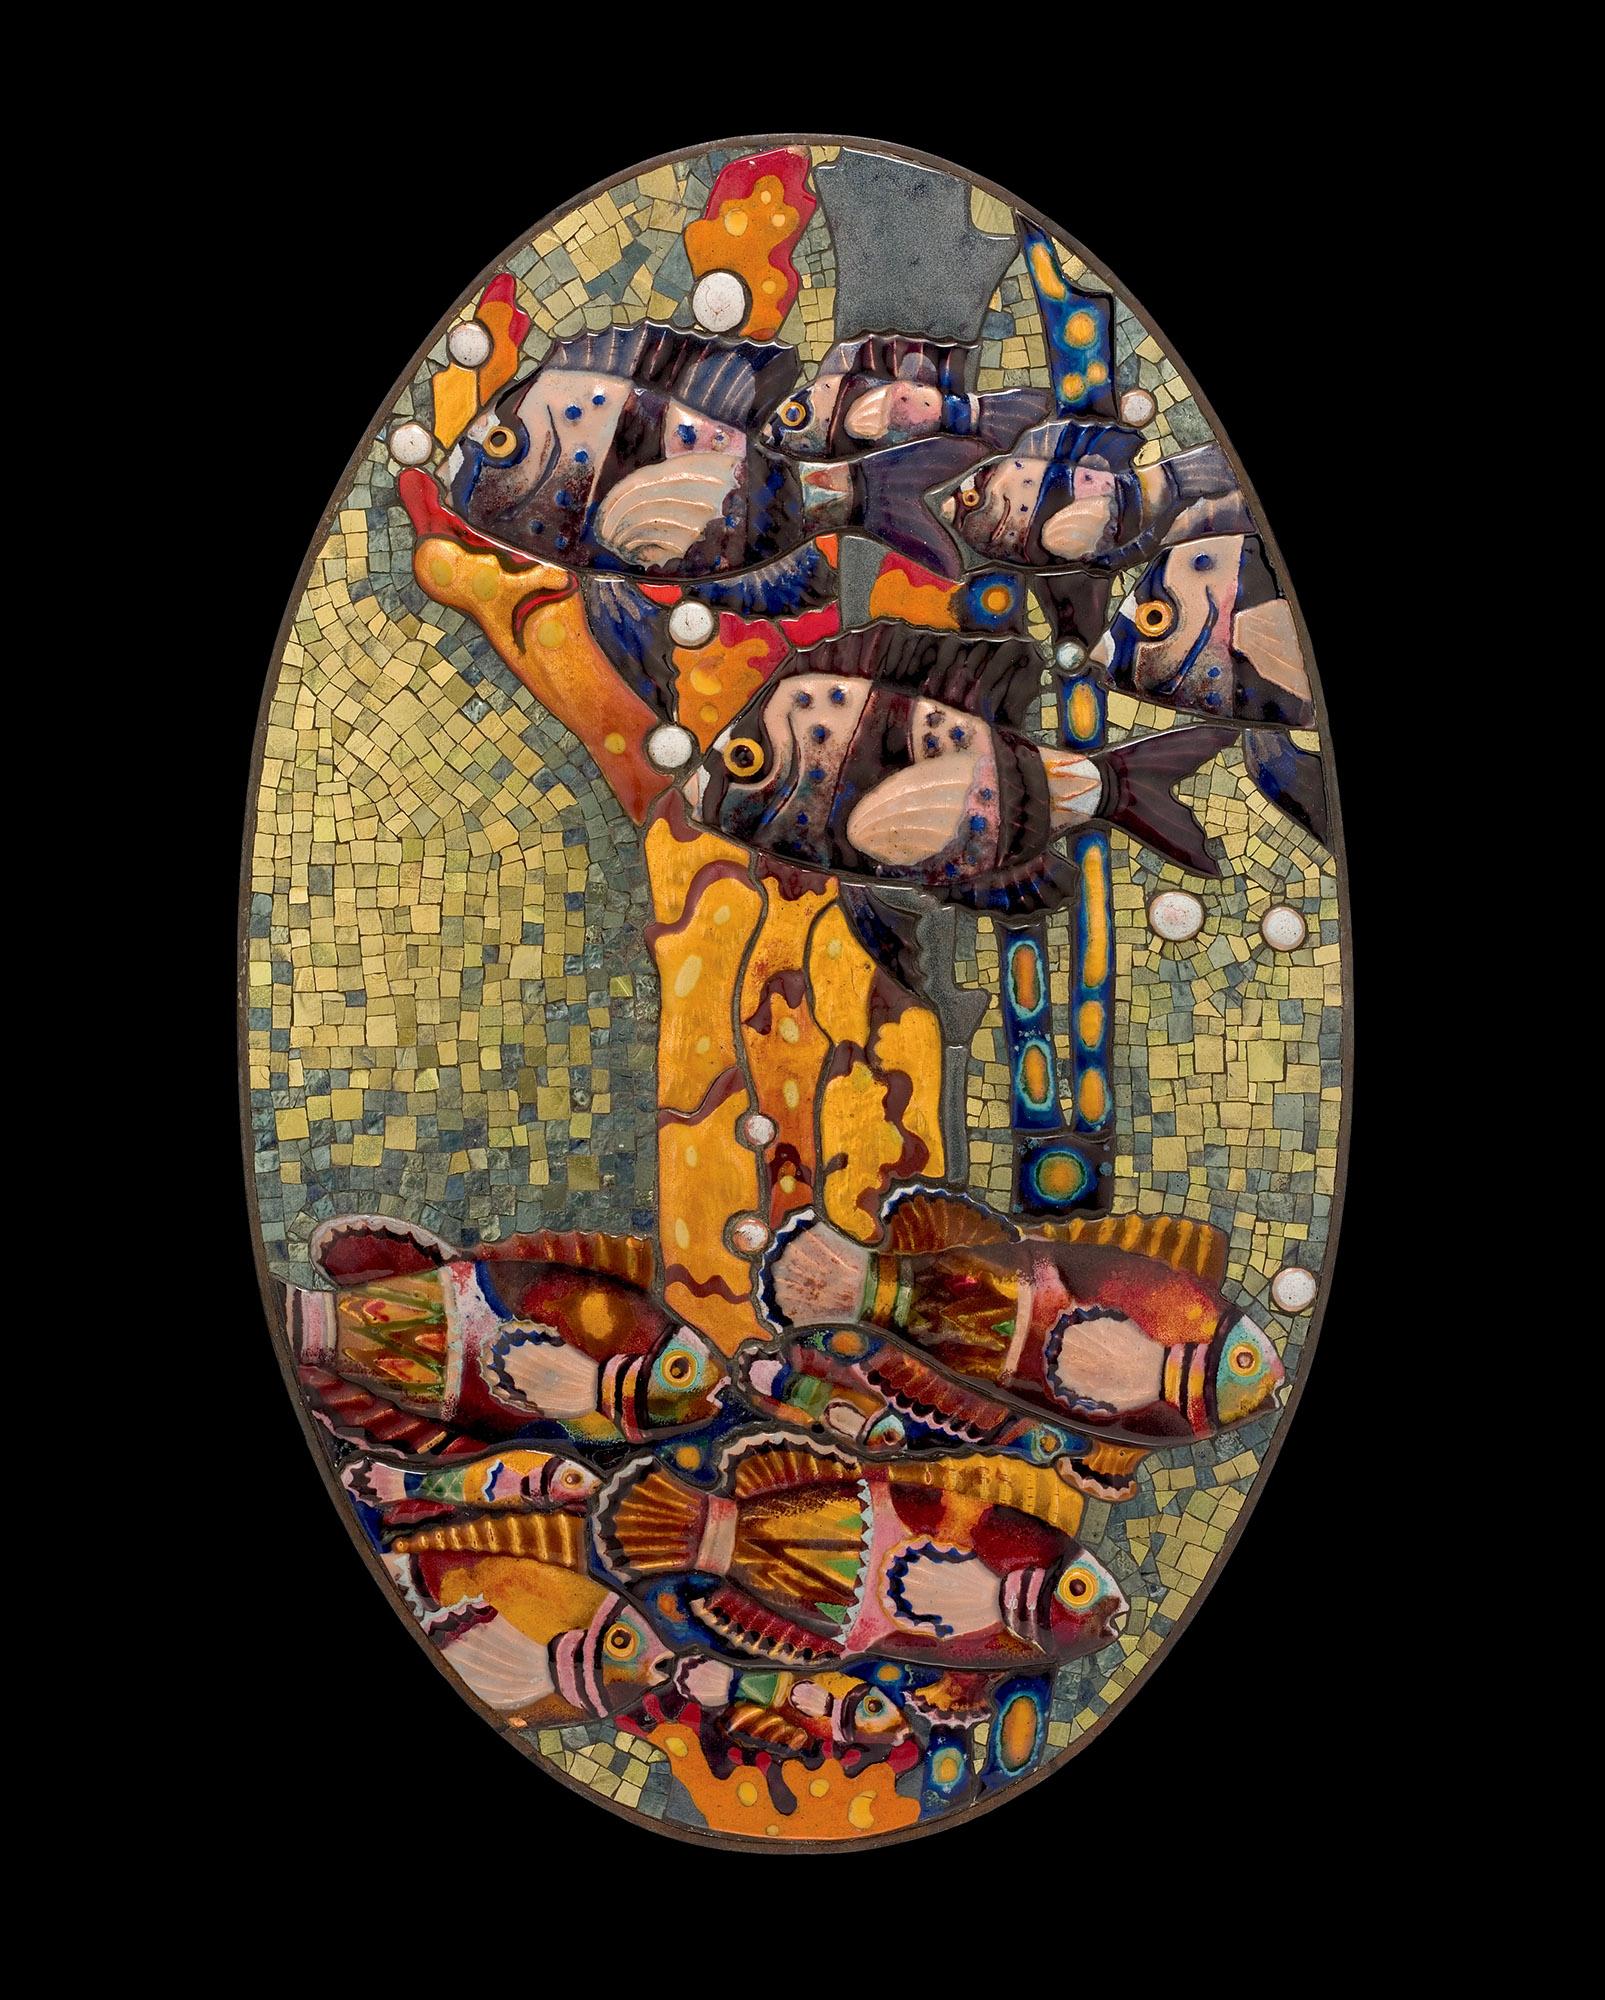 Mosaic with Fish